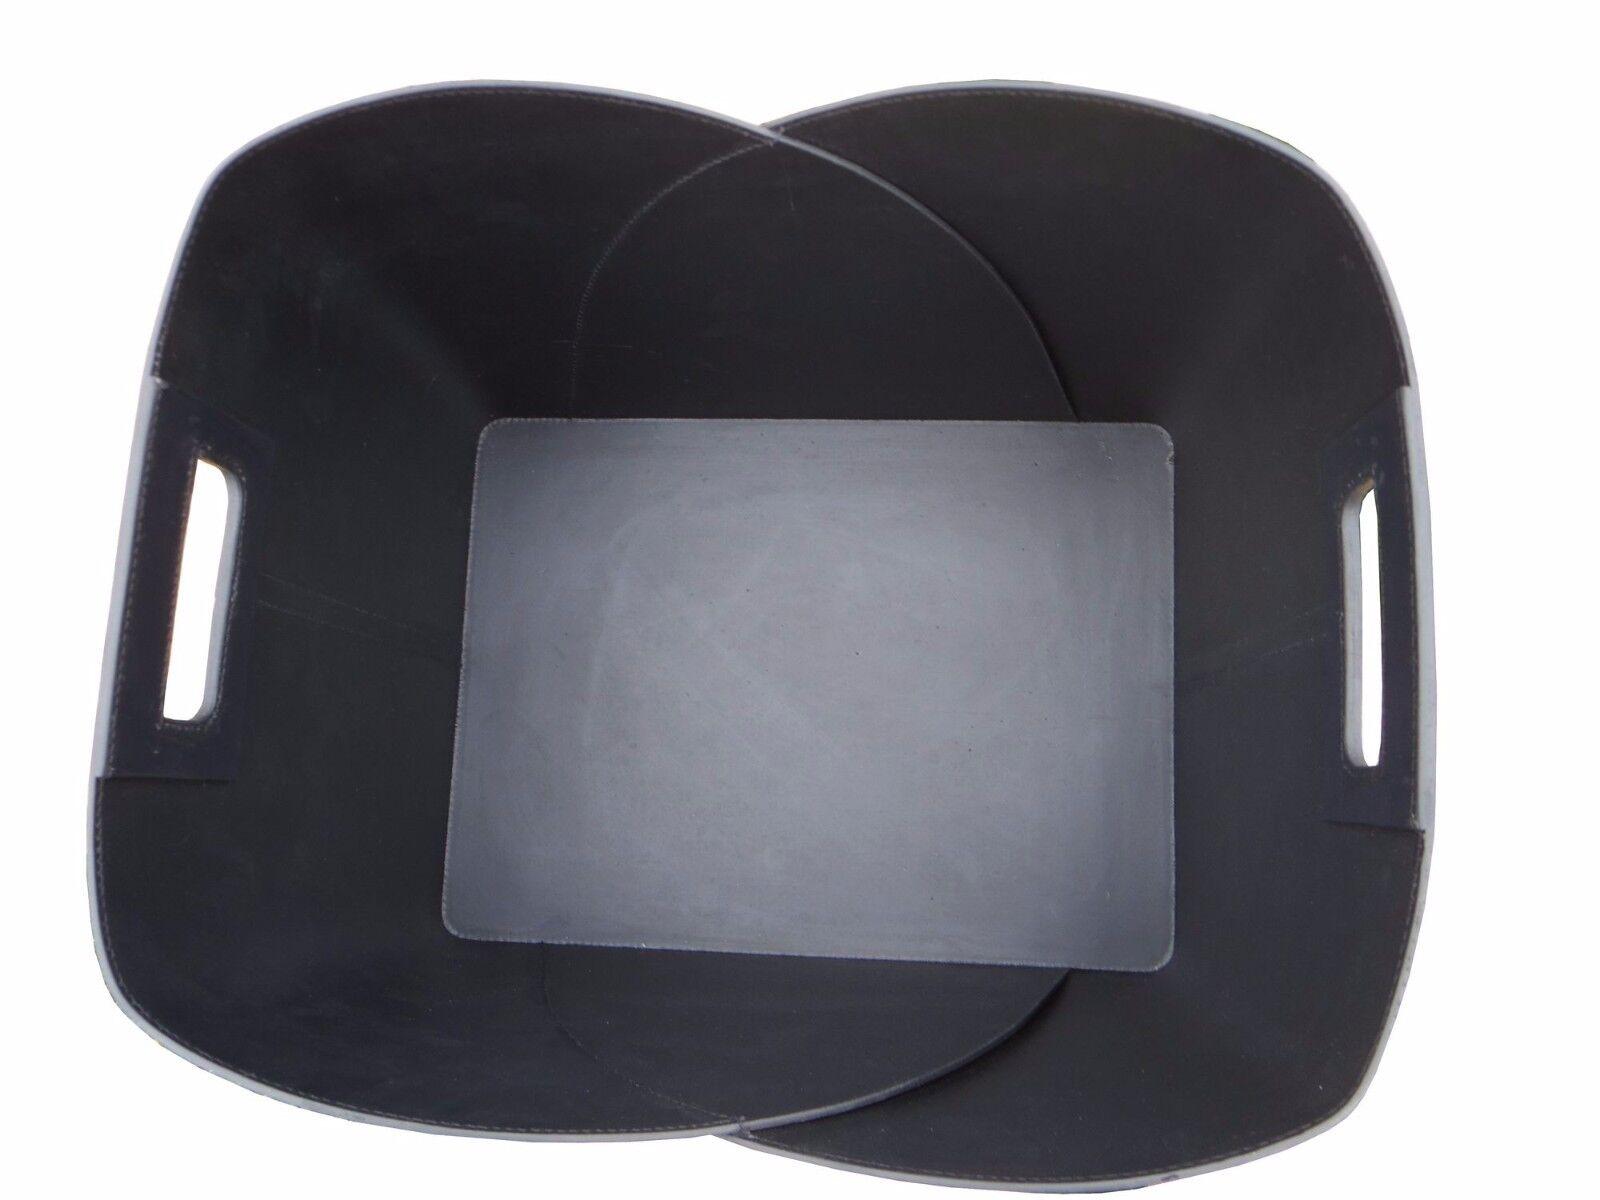 Holzkorb Holzkorb Holzkorb Umschlag Lederkorb schwarz aus recyceltem Leder für Kaminholz 2e57a0